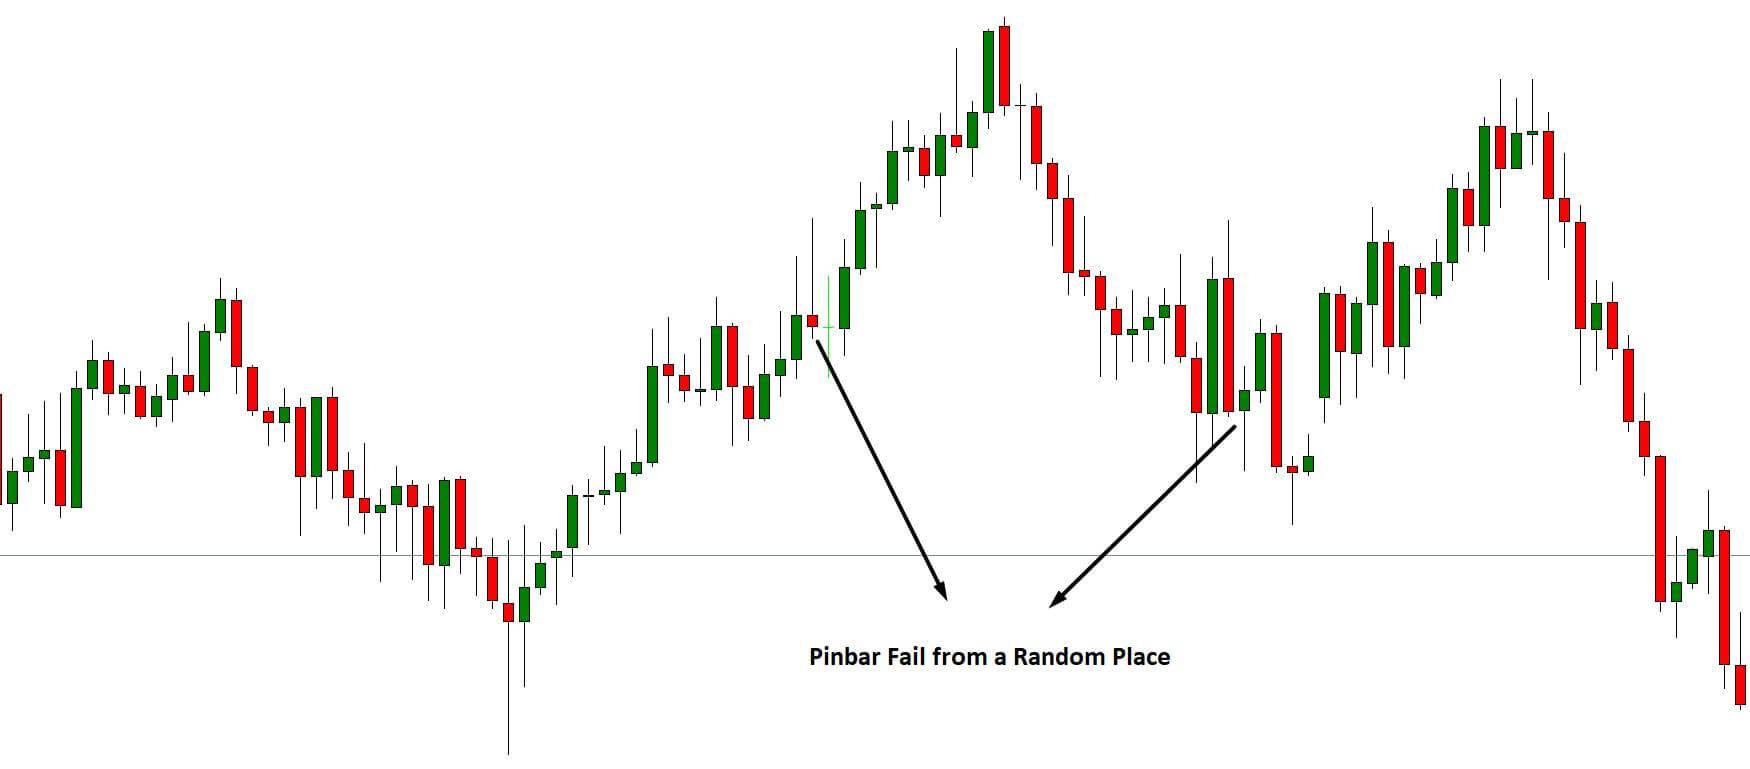 How to Trade the Pinbar